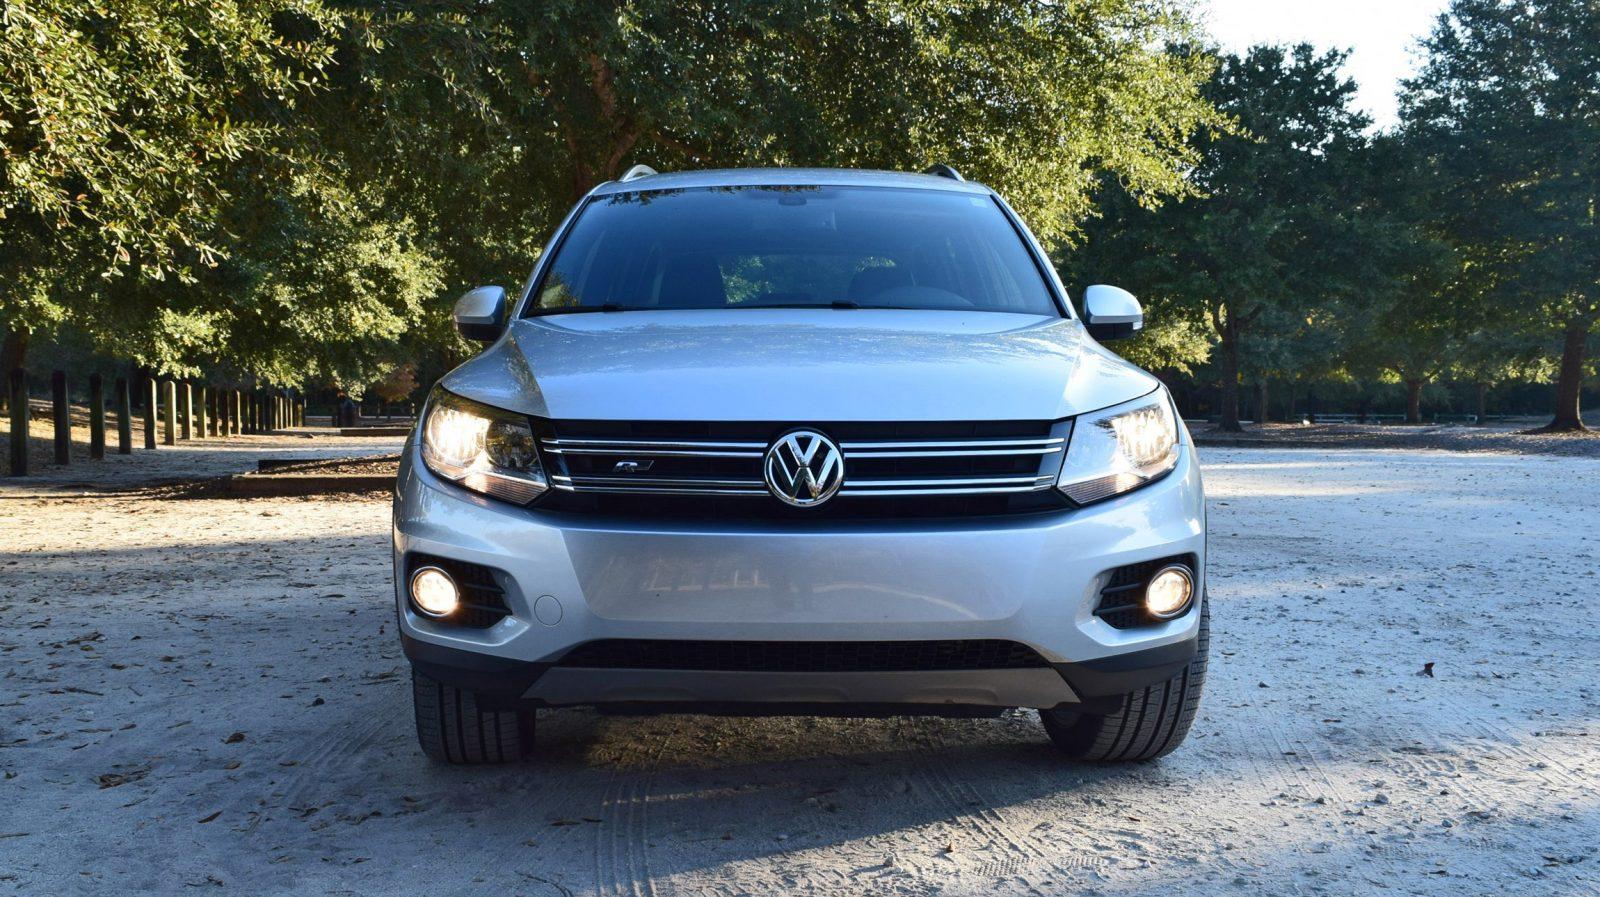 2016 Volkswagen TIGUAN R-Line 4Motion - Road Test Review - By Tom Burkart » Car-Revs-Daily.com